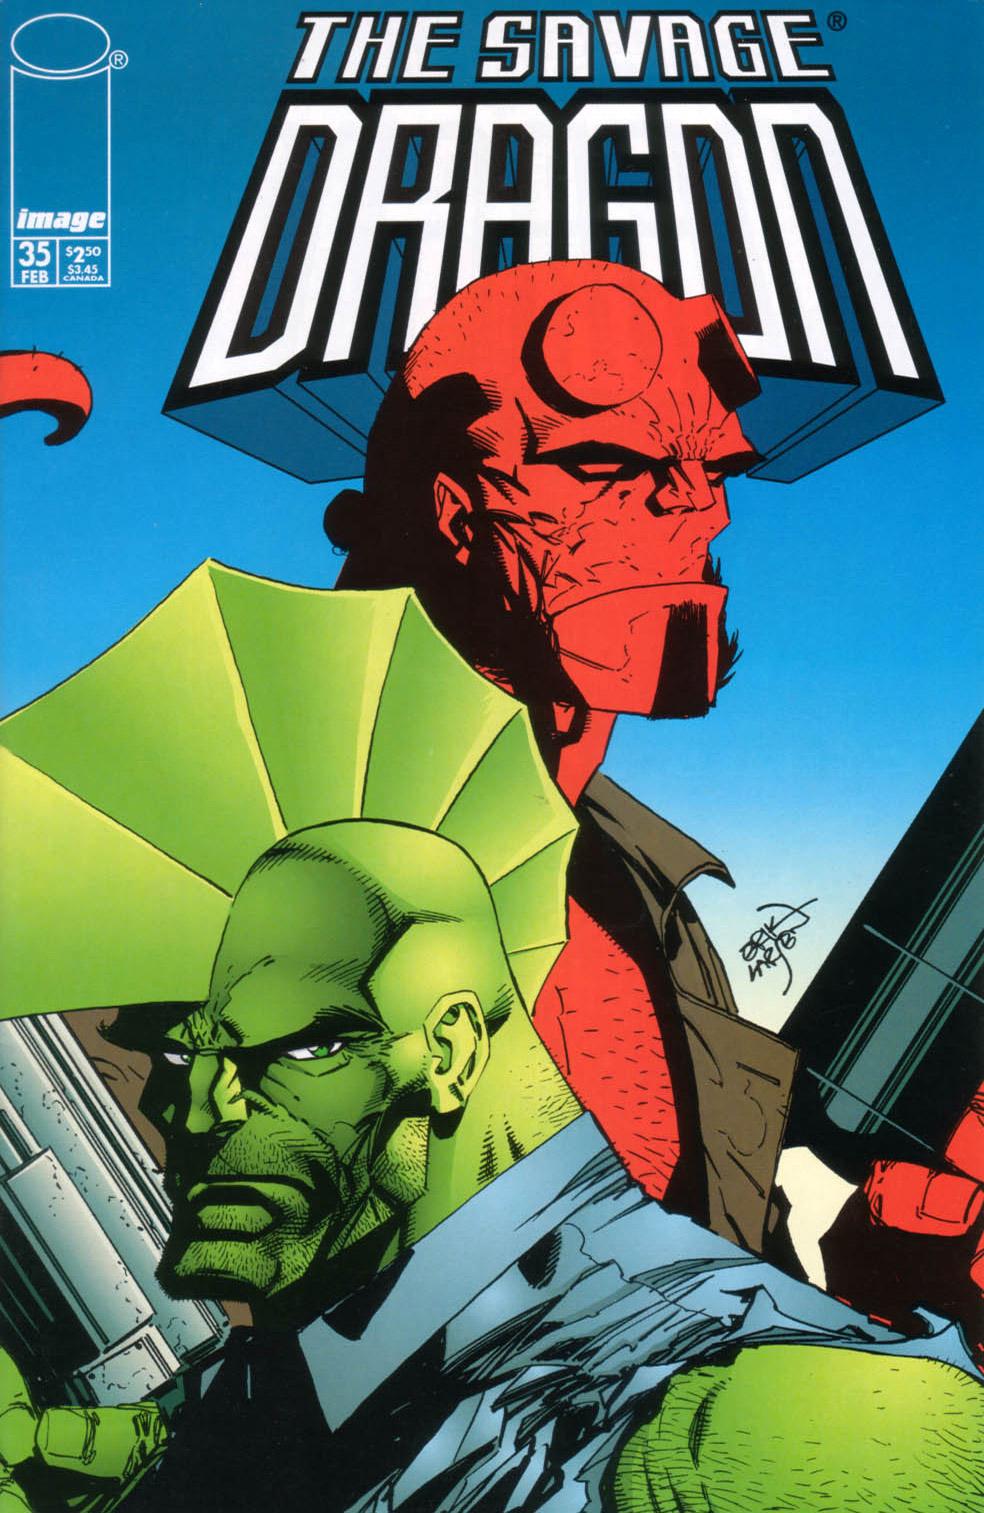 Cover Savage Dragon Vol.2 #35